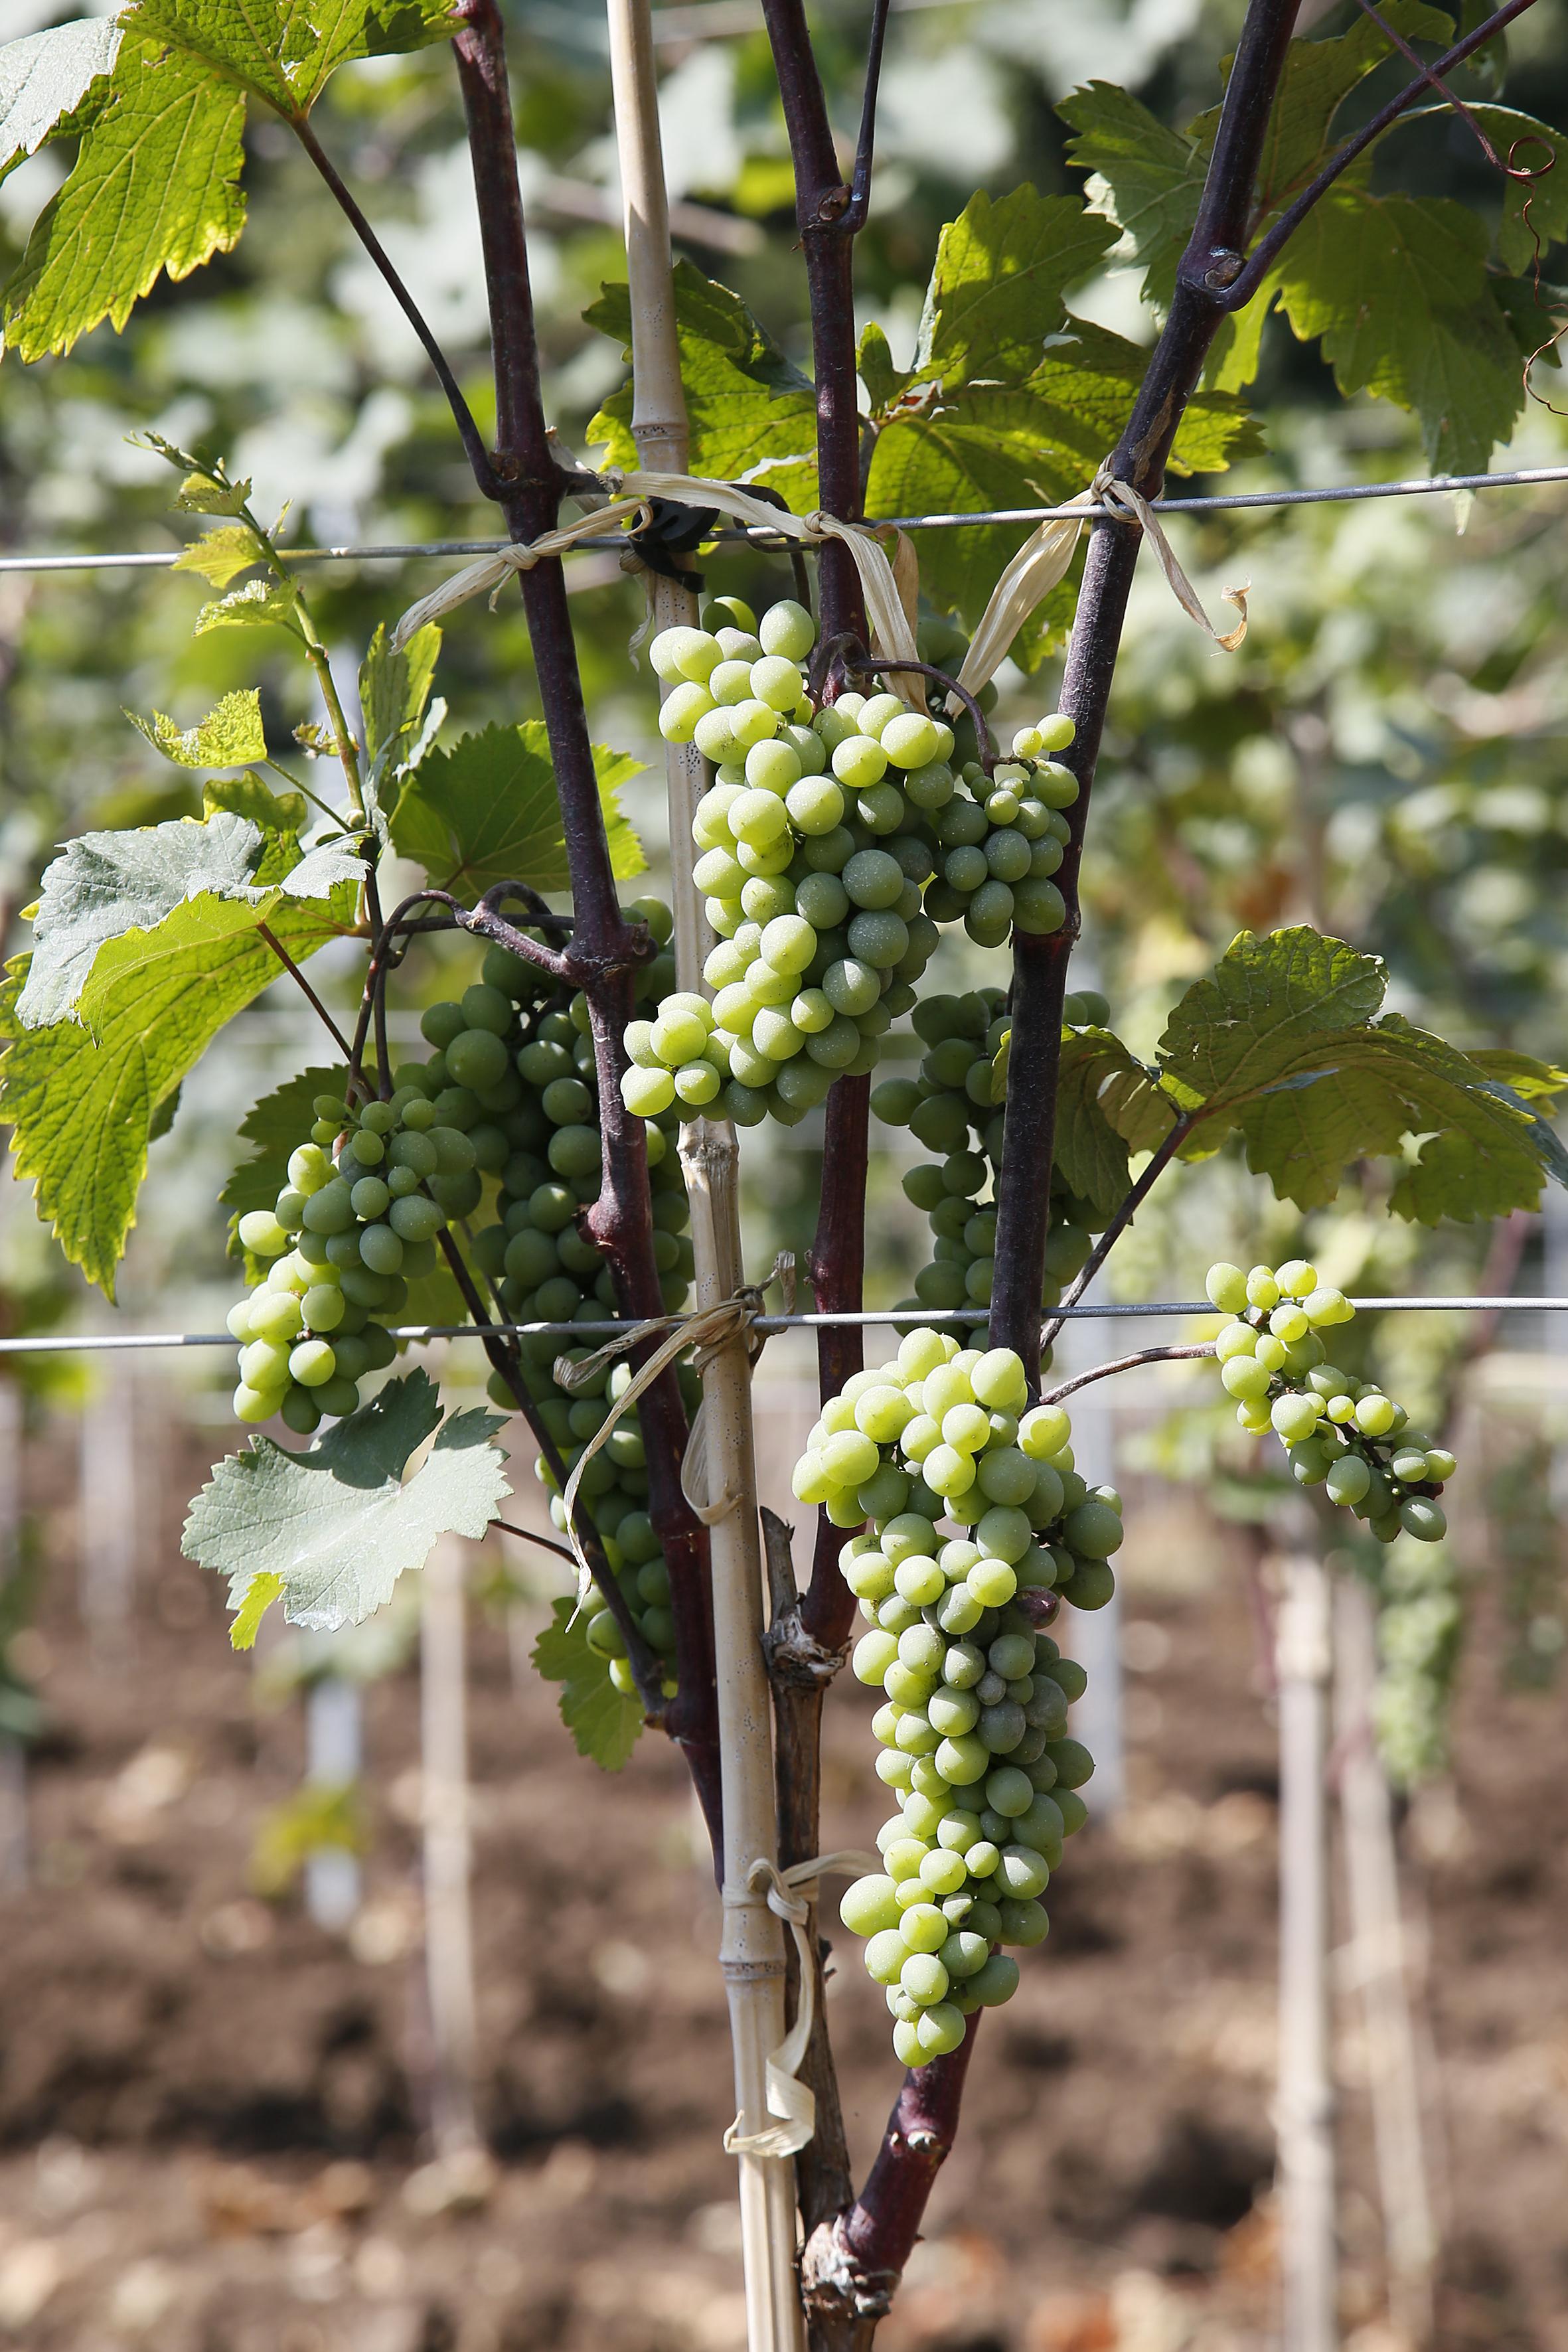 Close up of a Georgian grape variety Mtsvane. Used for amber or orange wine.